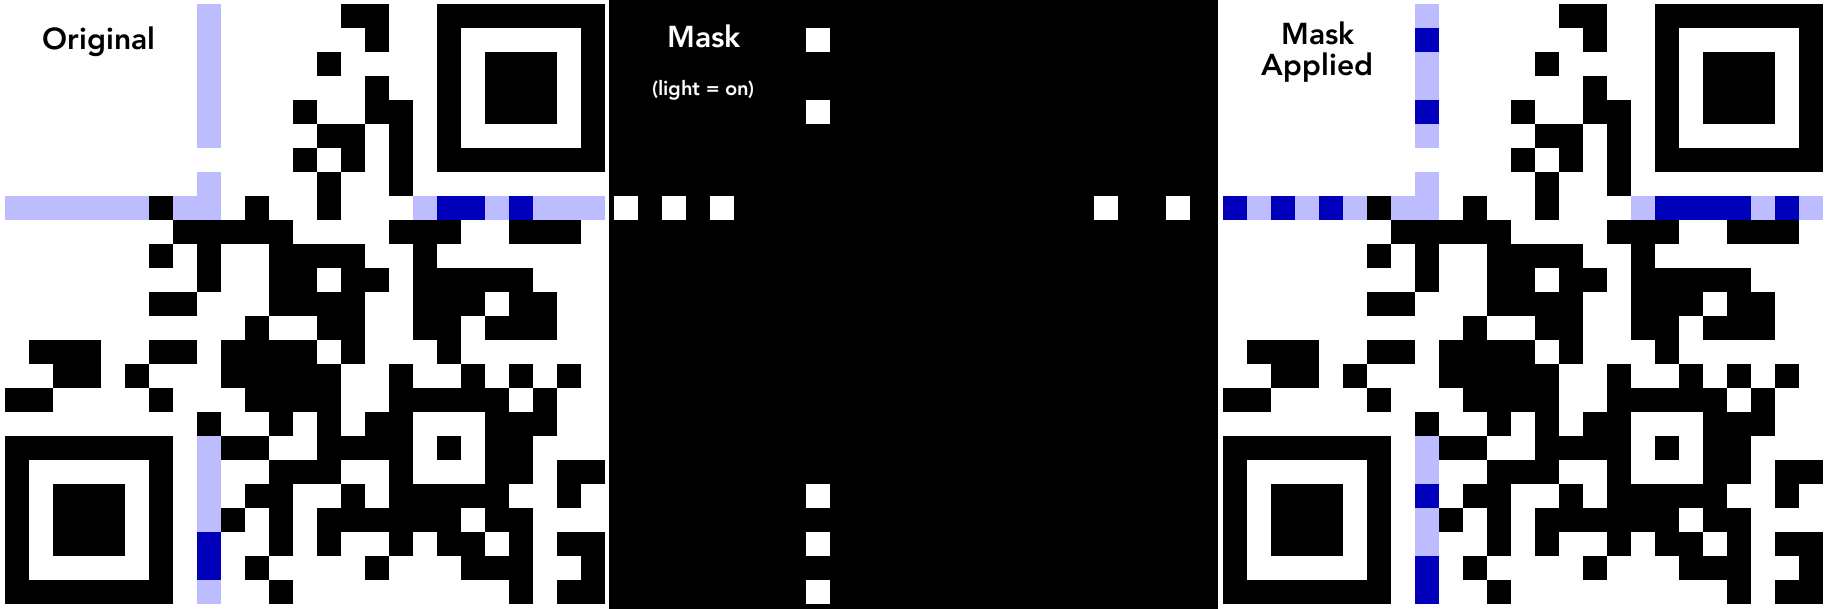 fez_format_bitmask.png